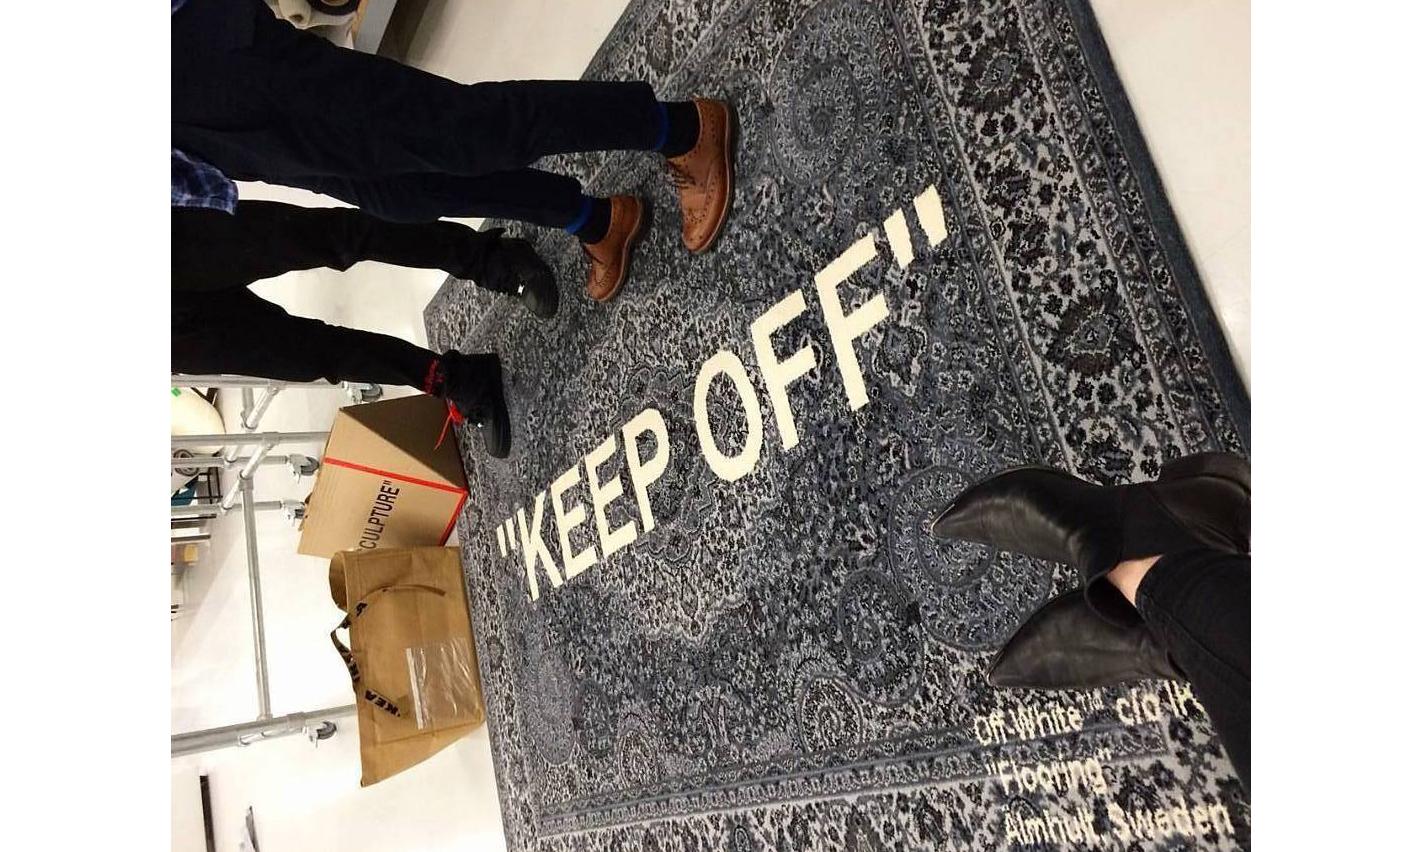 OFF-WHITE x IKEA 联名地毯原来是这样的